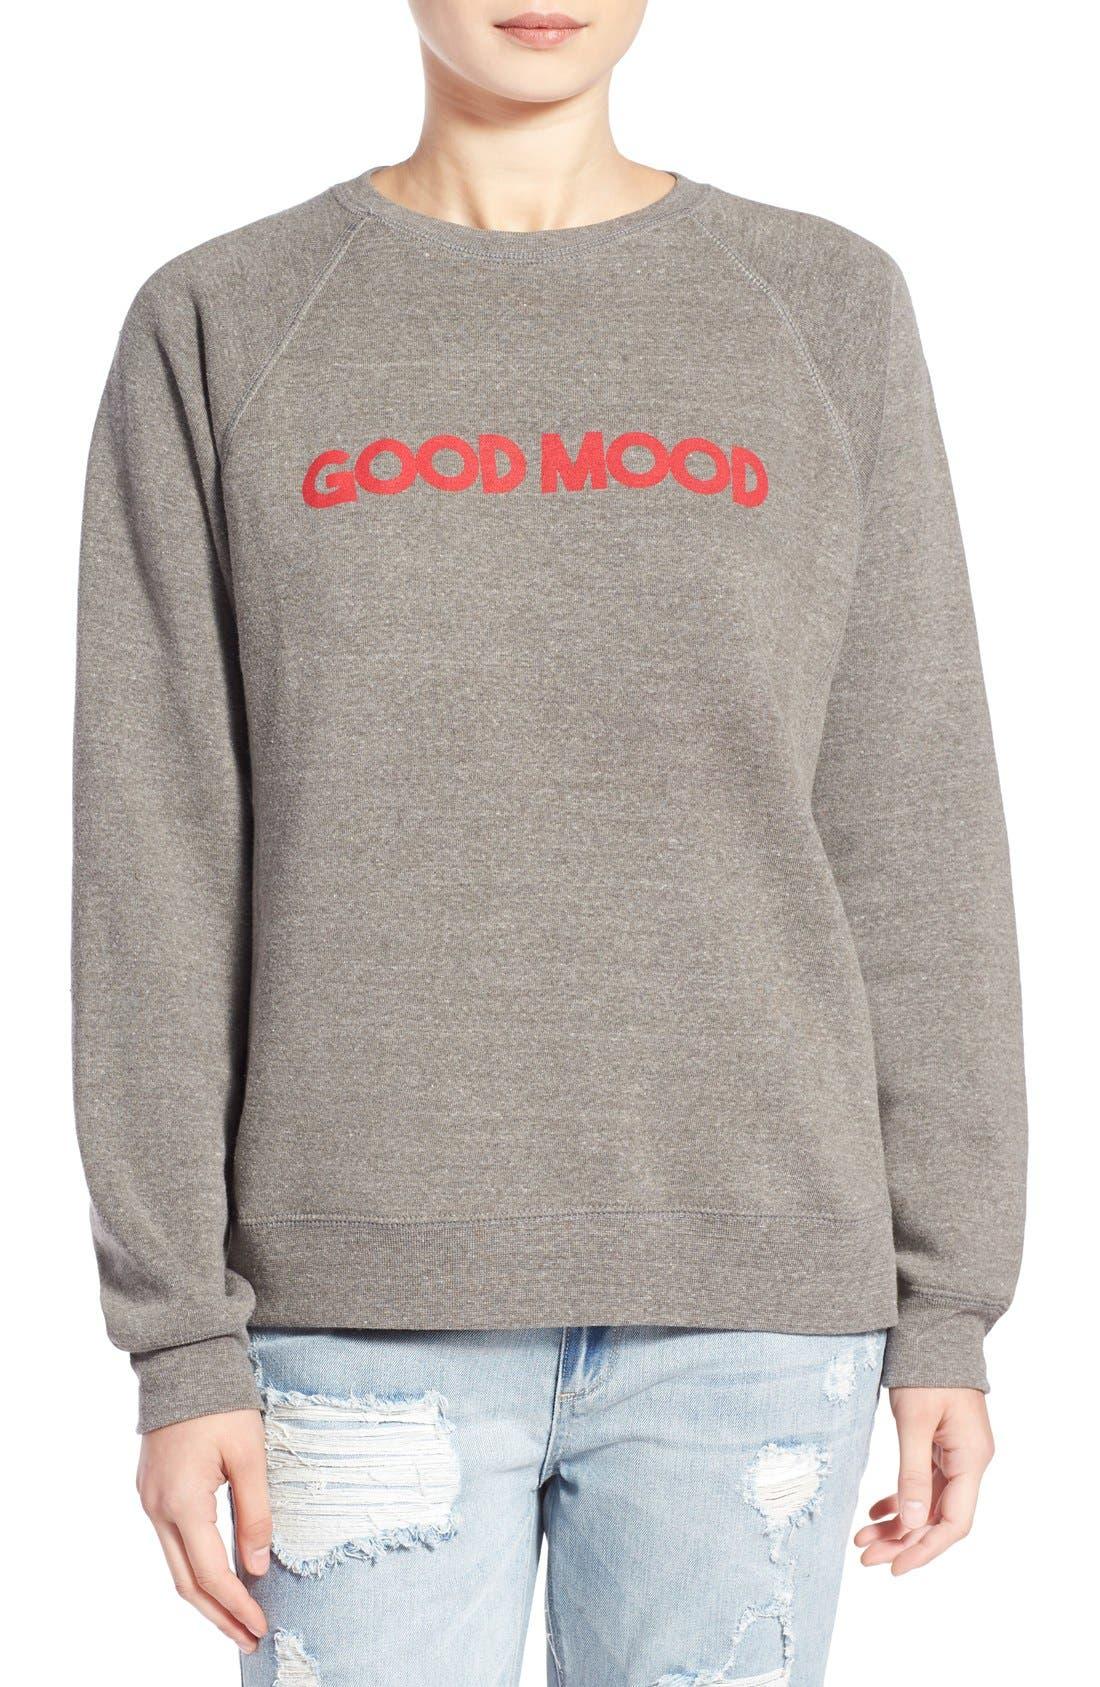 'Good Mood' Graphic Sweatshirt,                             Main thumbnail 1, color,                             050